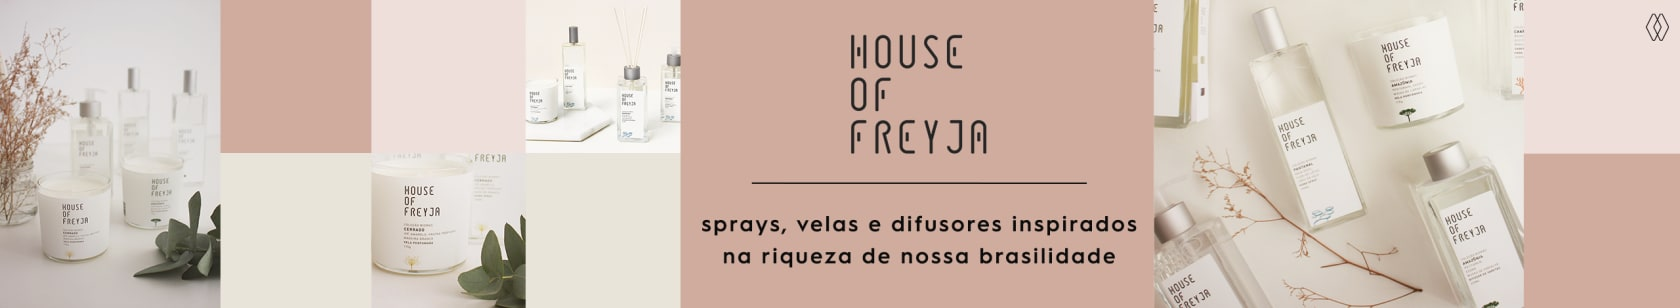 HOUSE OF FREYJA   AMARO